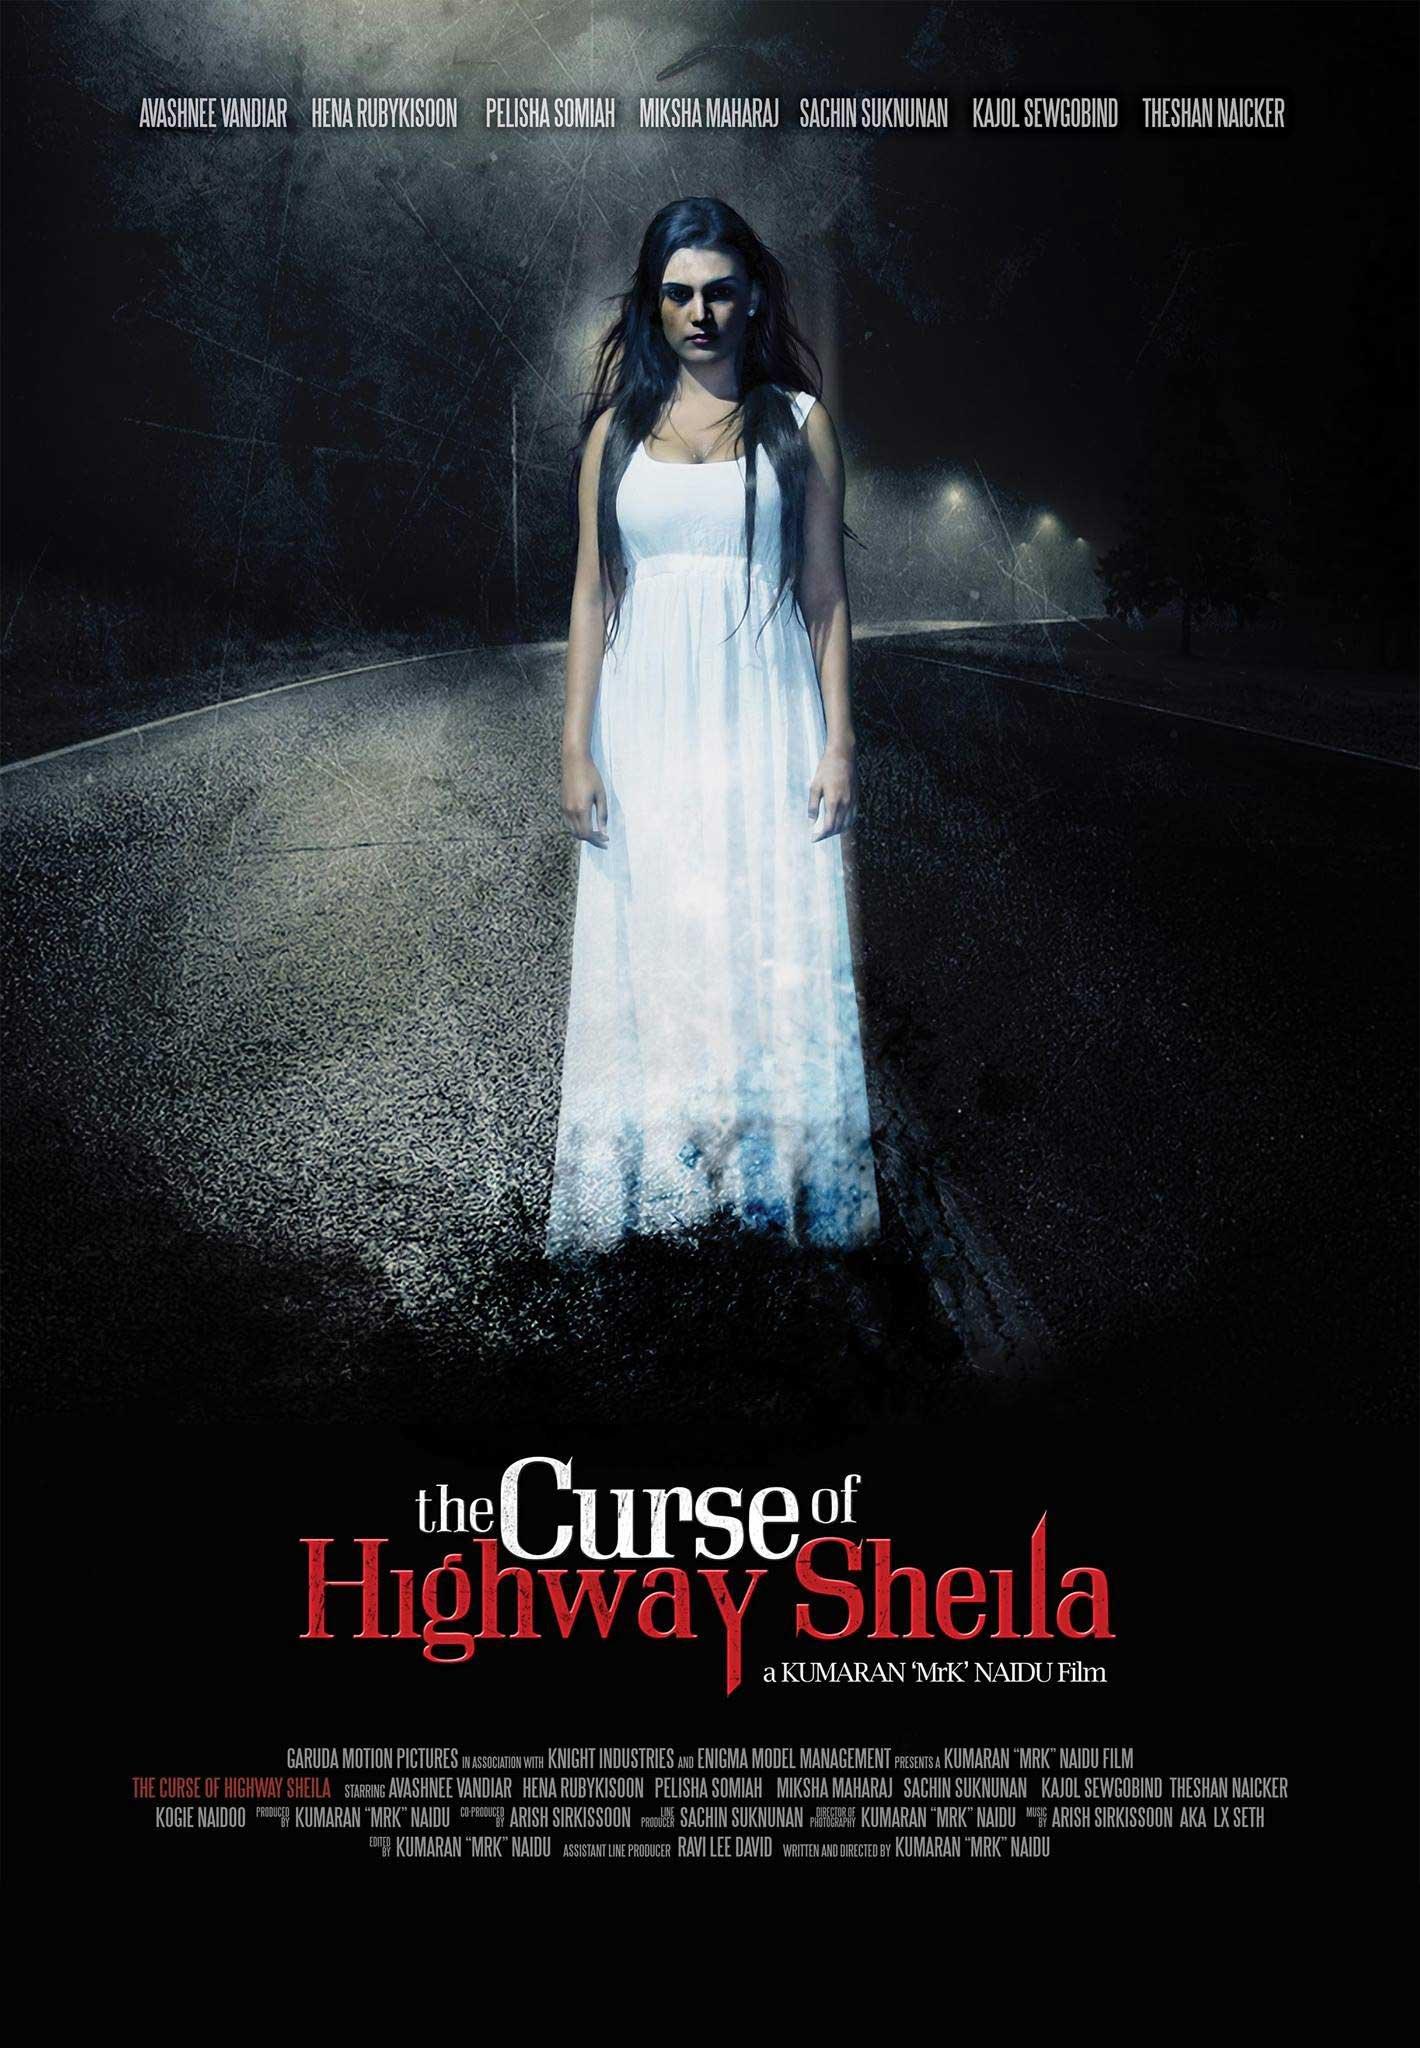 The Curse of Highway Sheila (2014) - IMDb